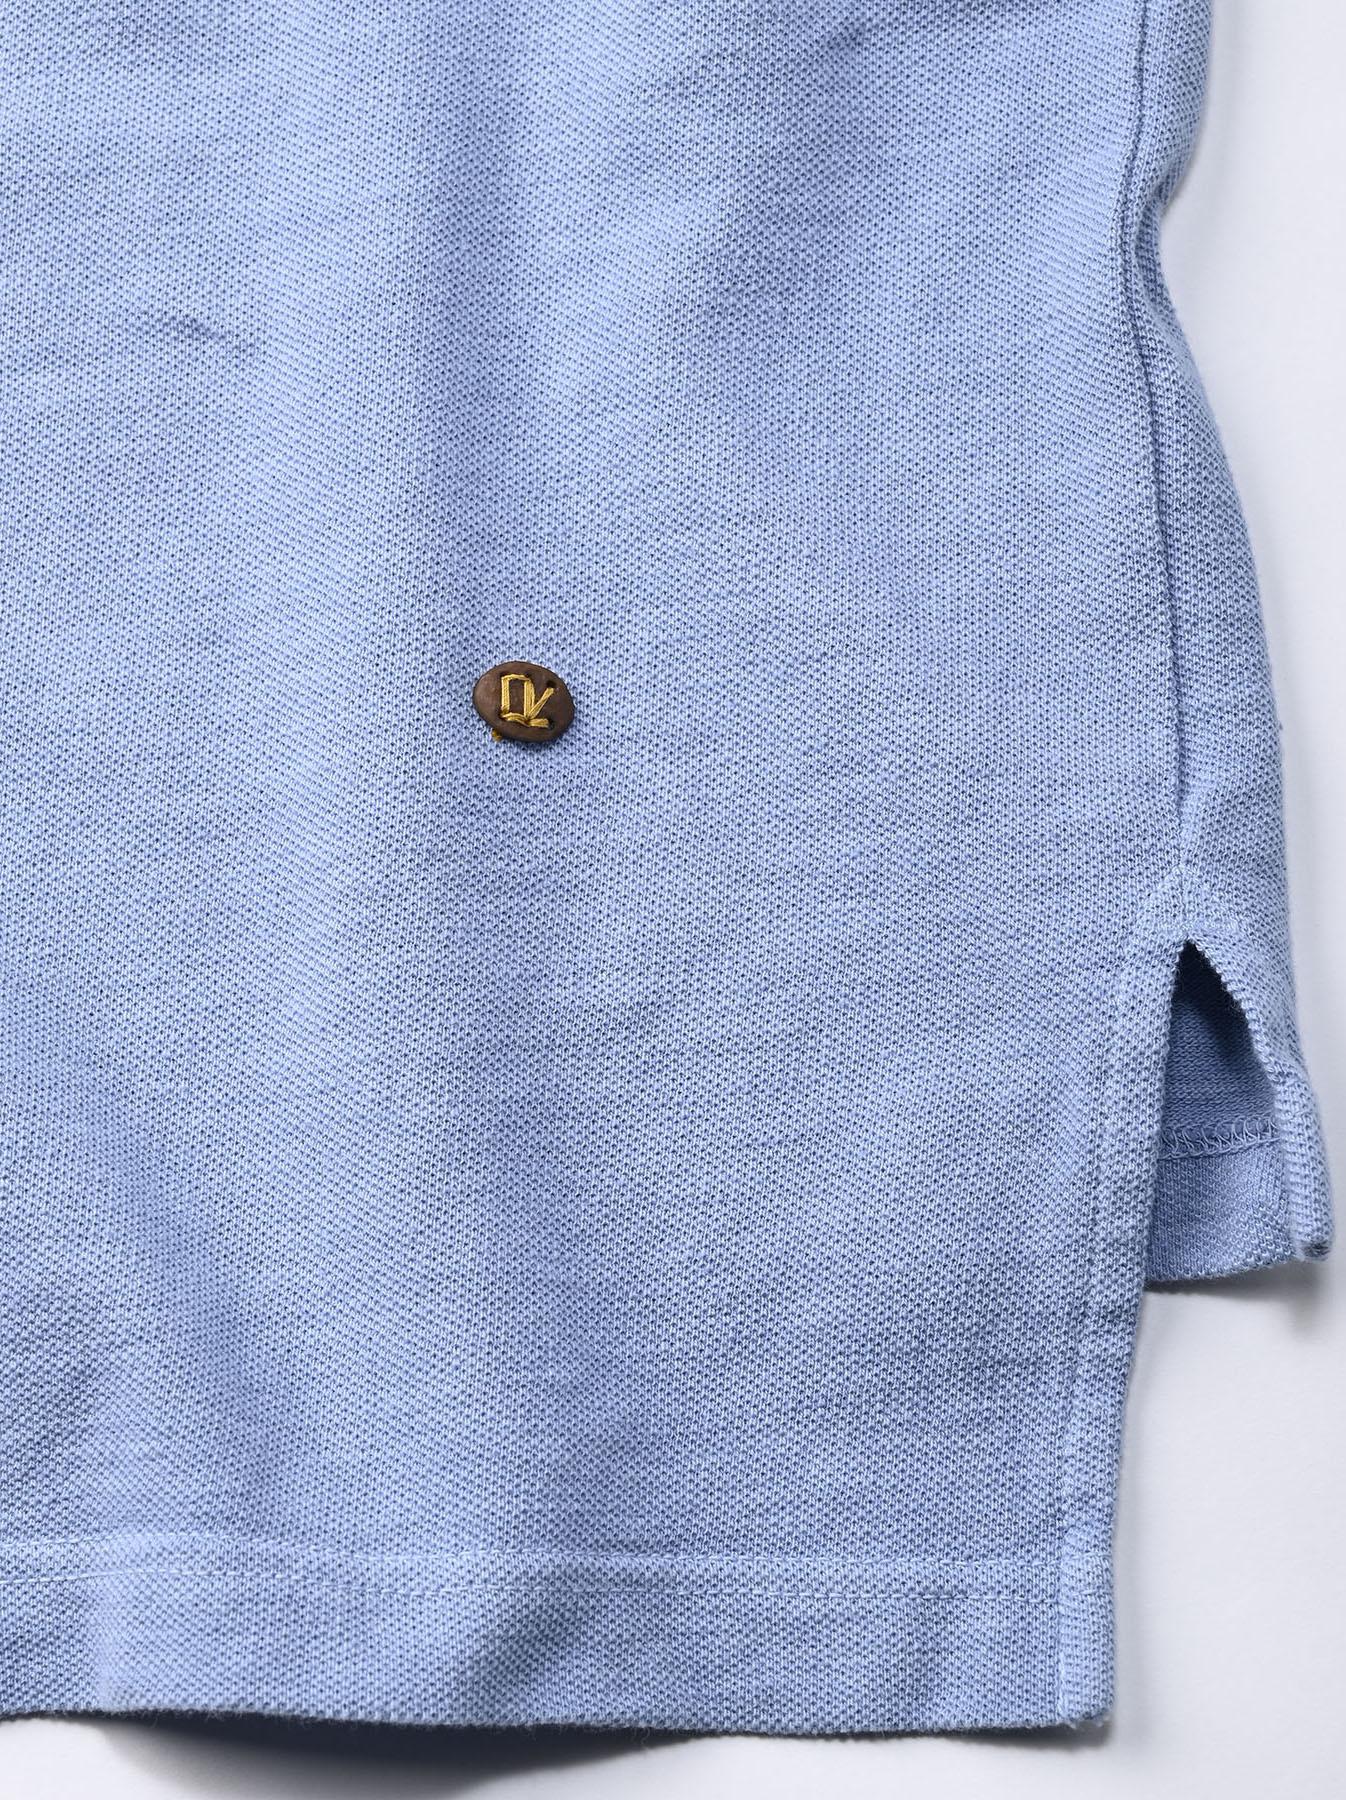 Kanoko Ocean Shiokaze Short-sleeved Polo Shirt (0521)-10